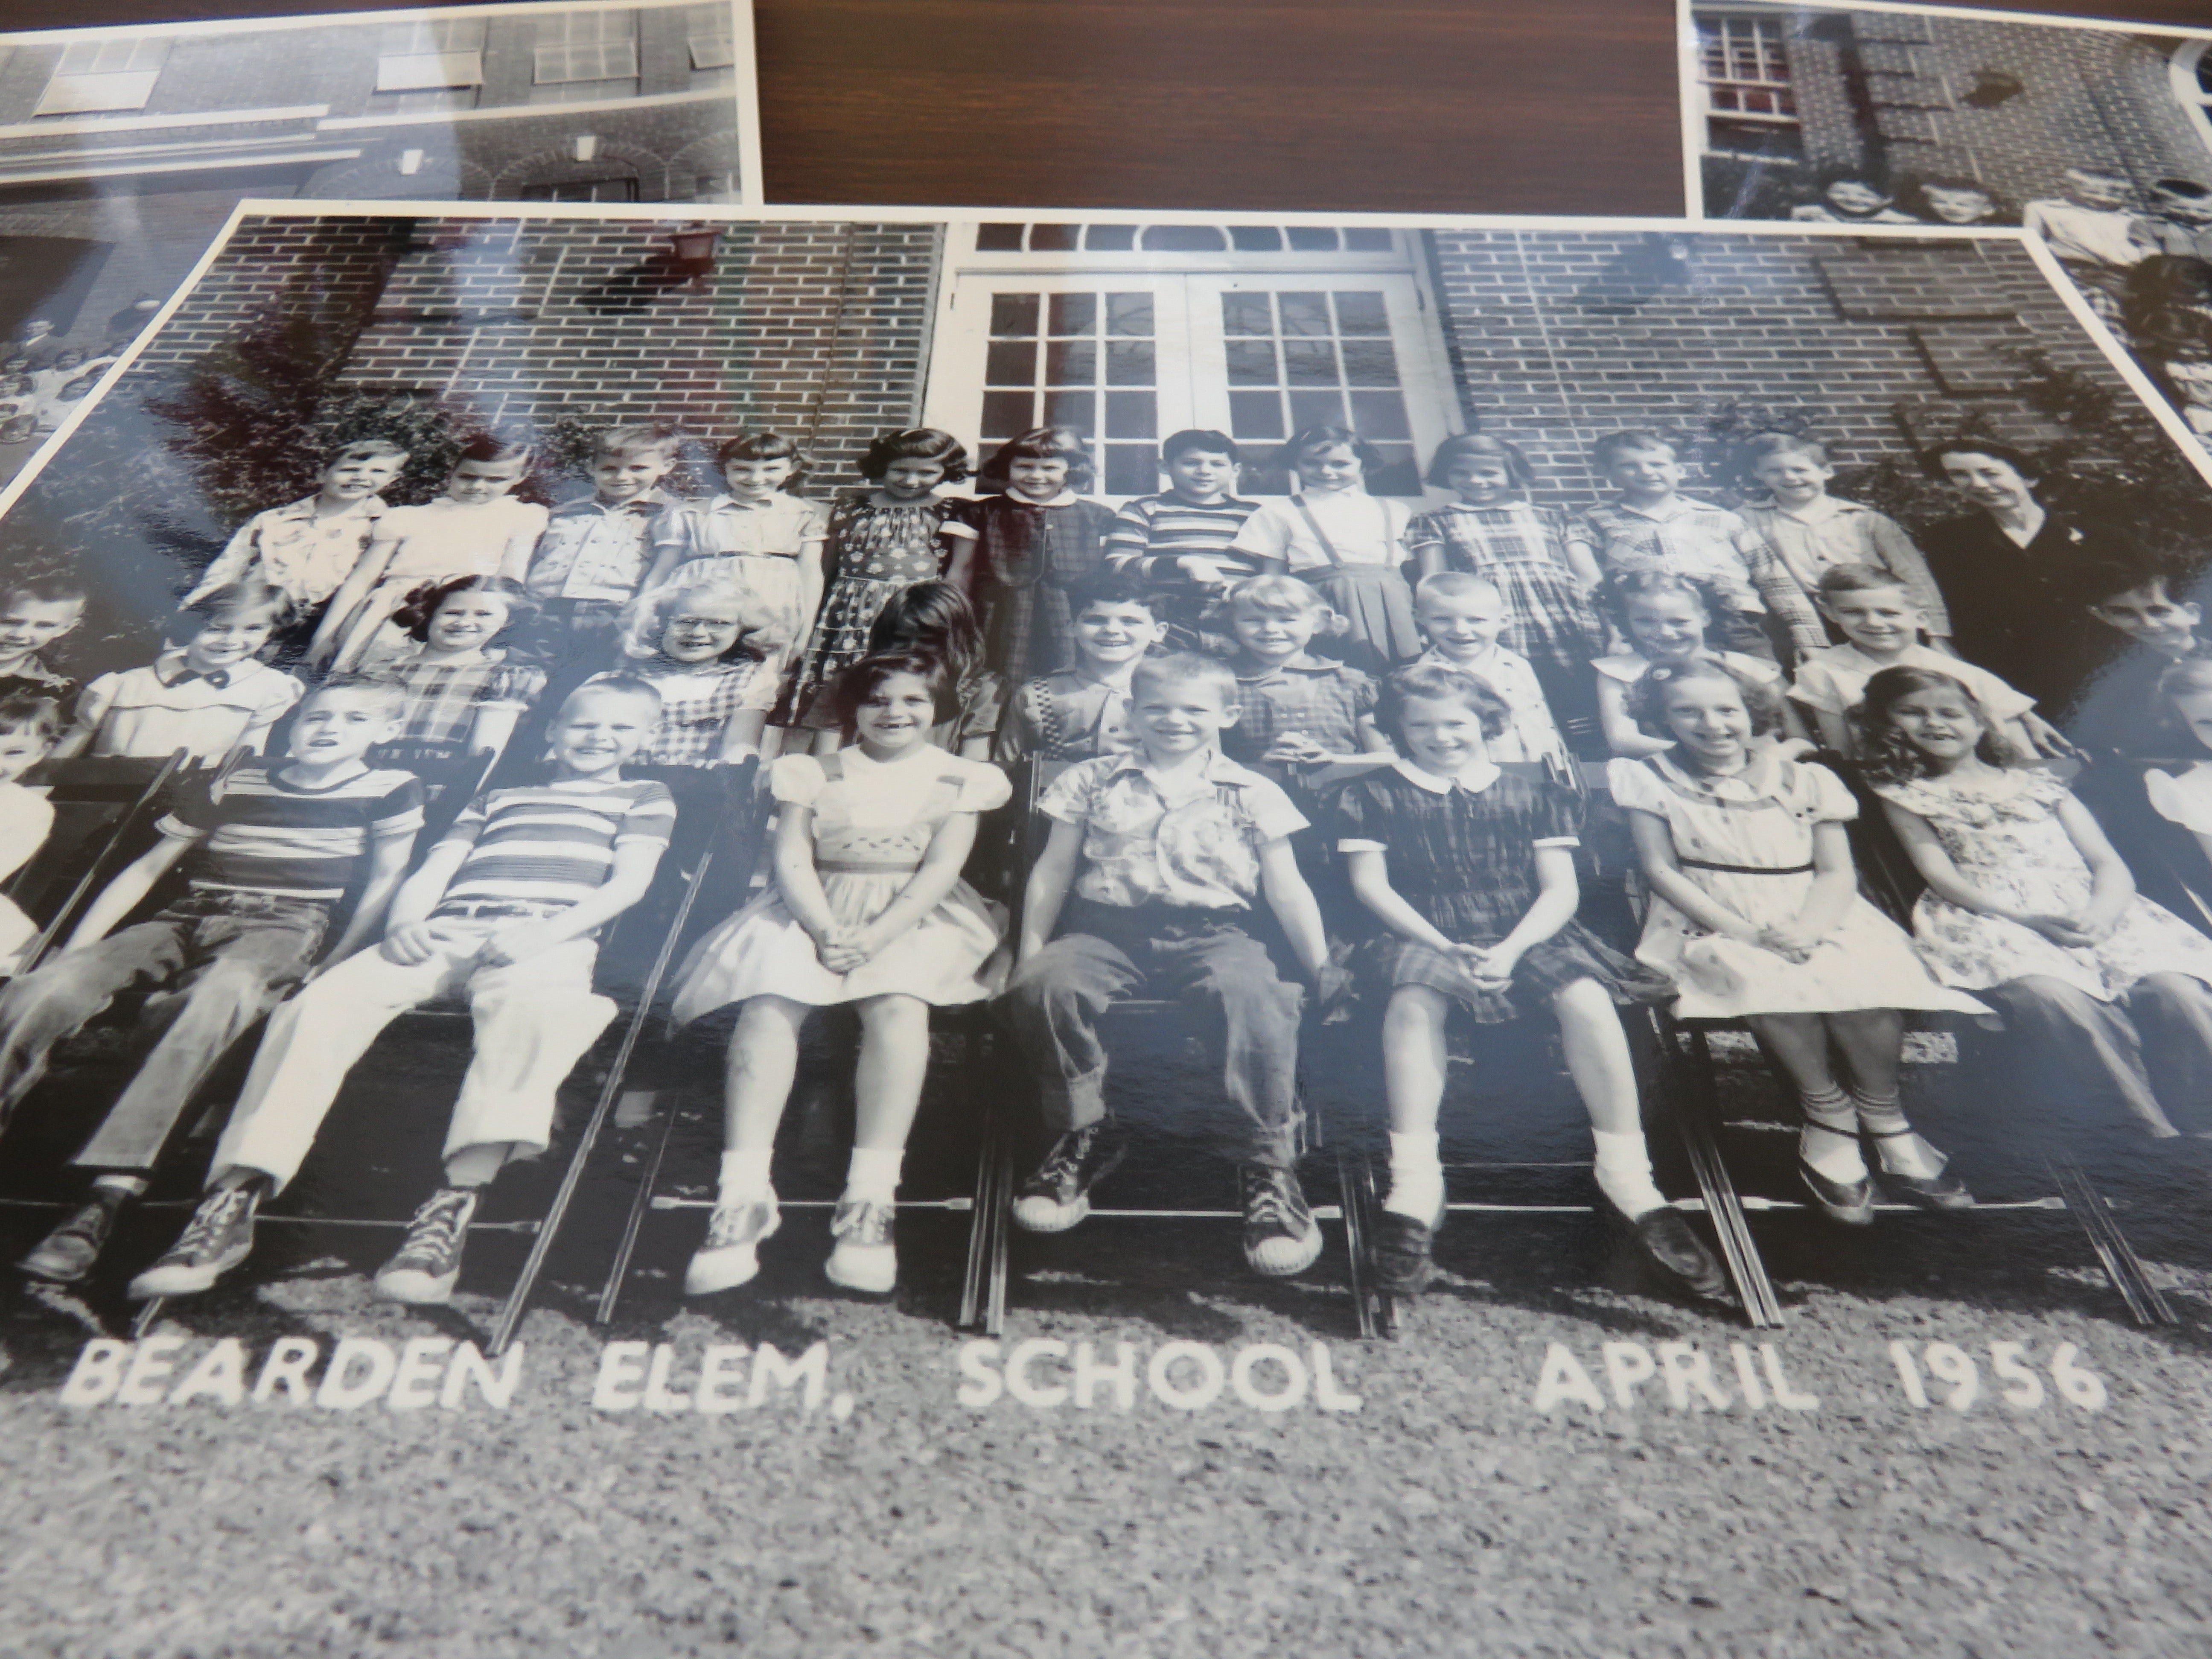 Students from Bearden Elementary, 1956.